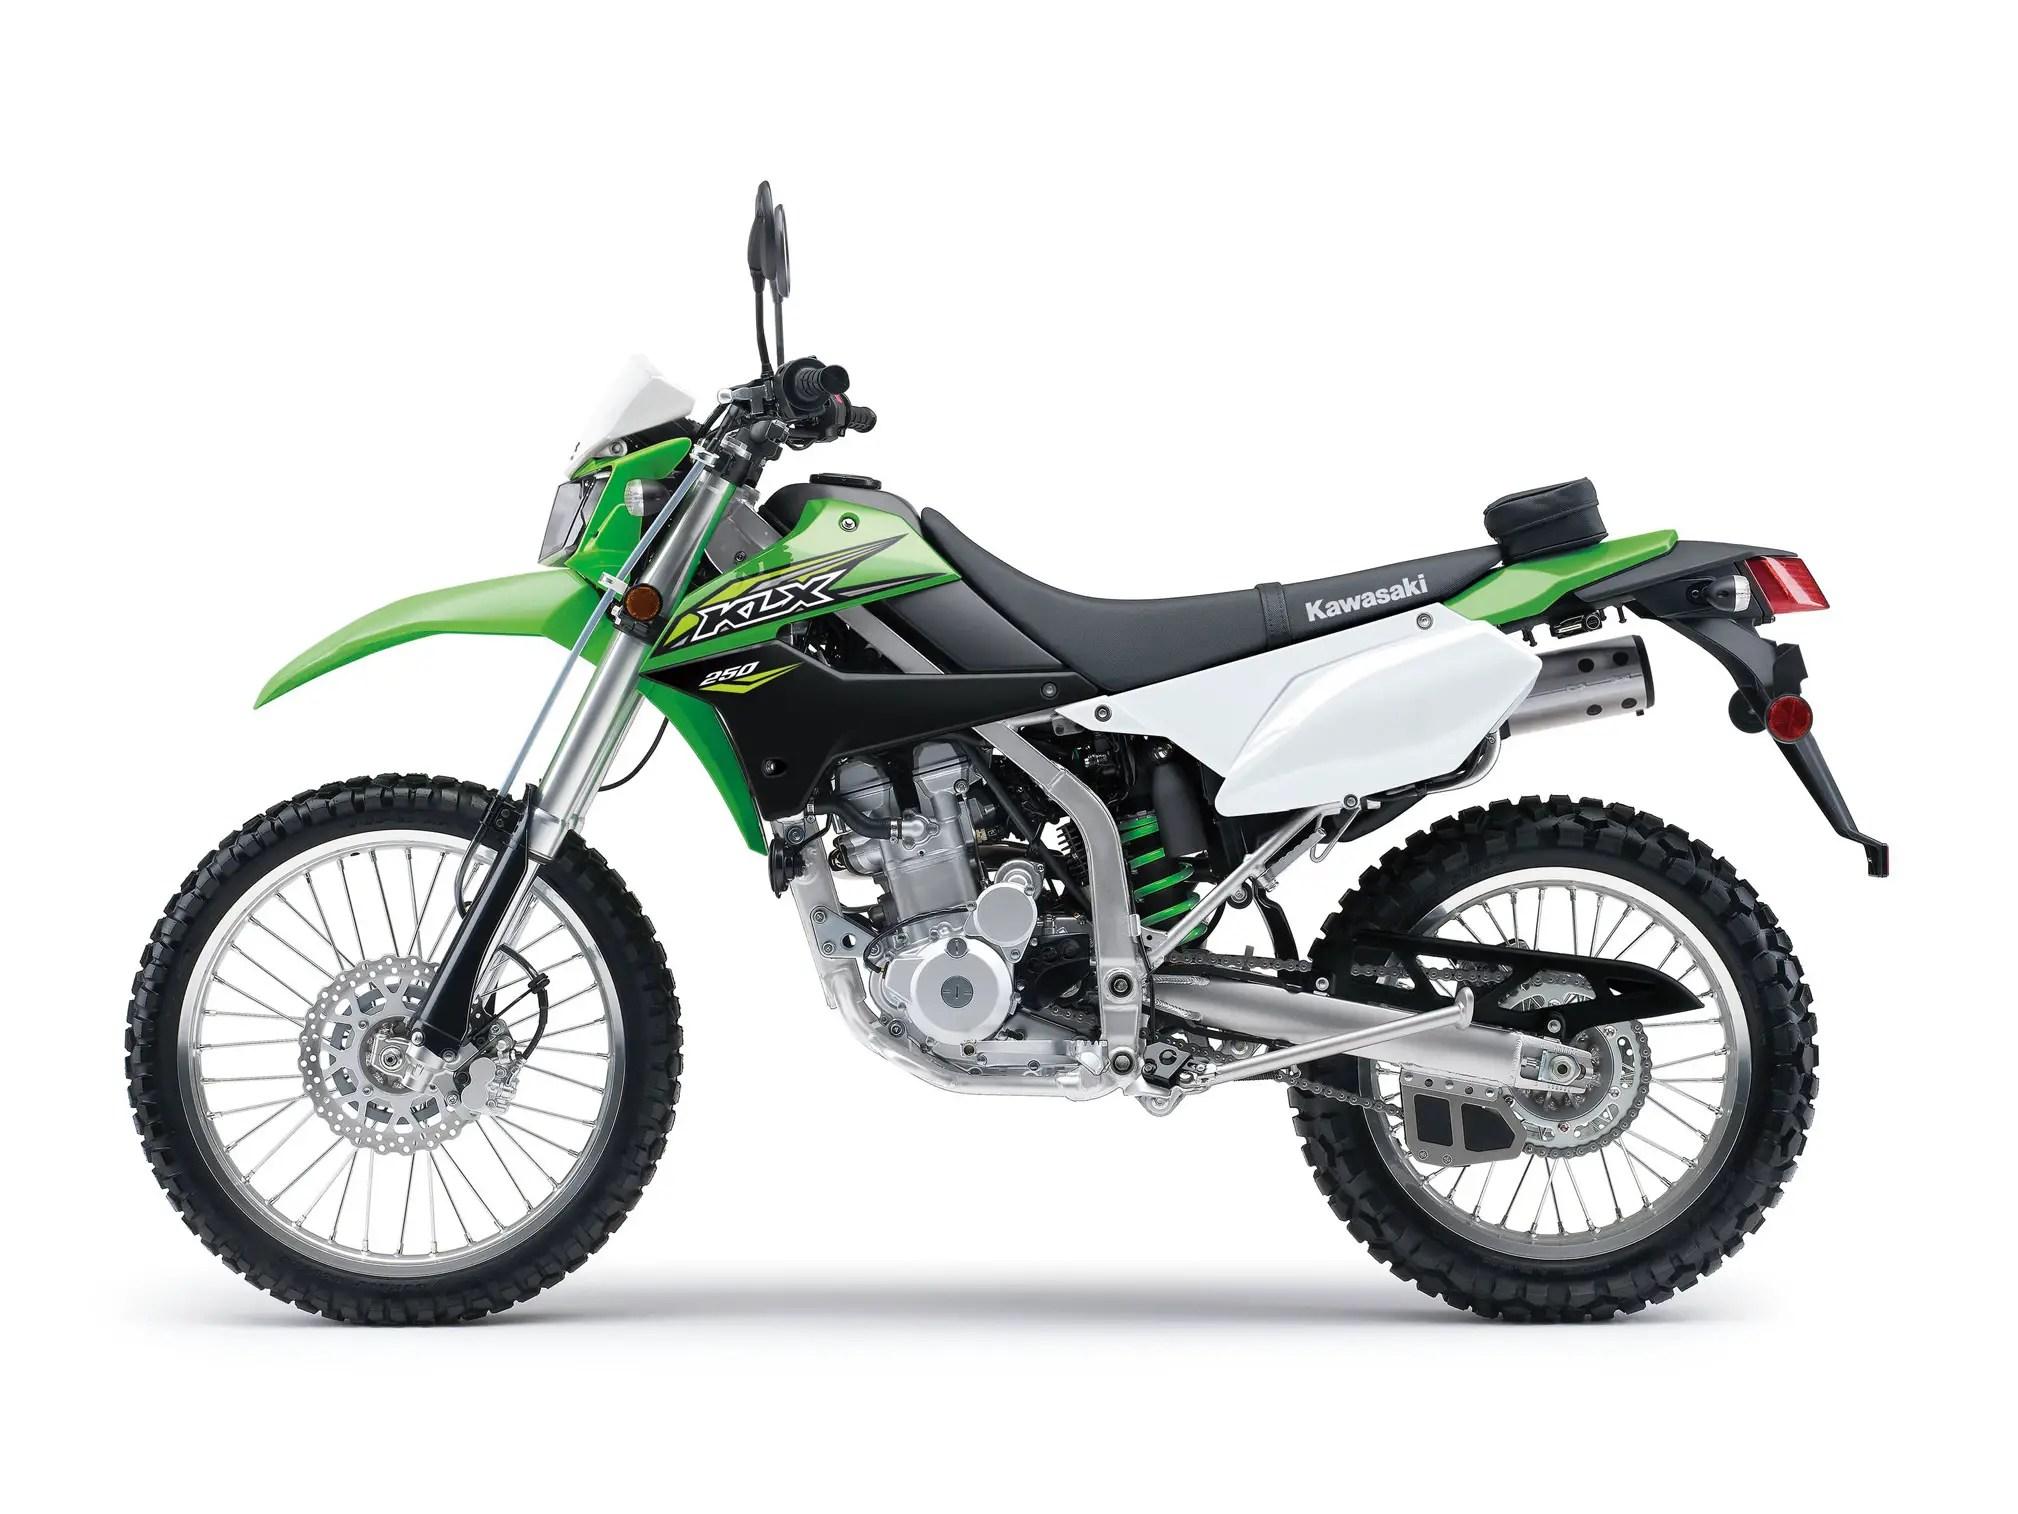 2018 Kawasaki KLX250S Review • Total Motorcycle